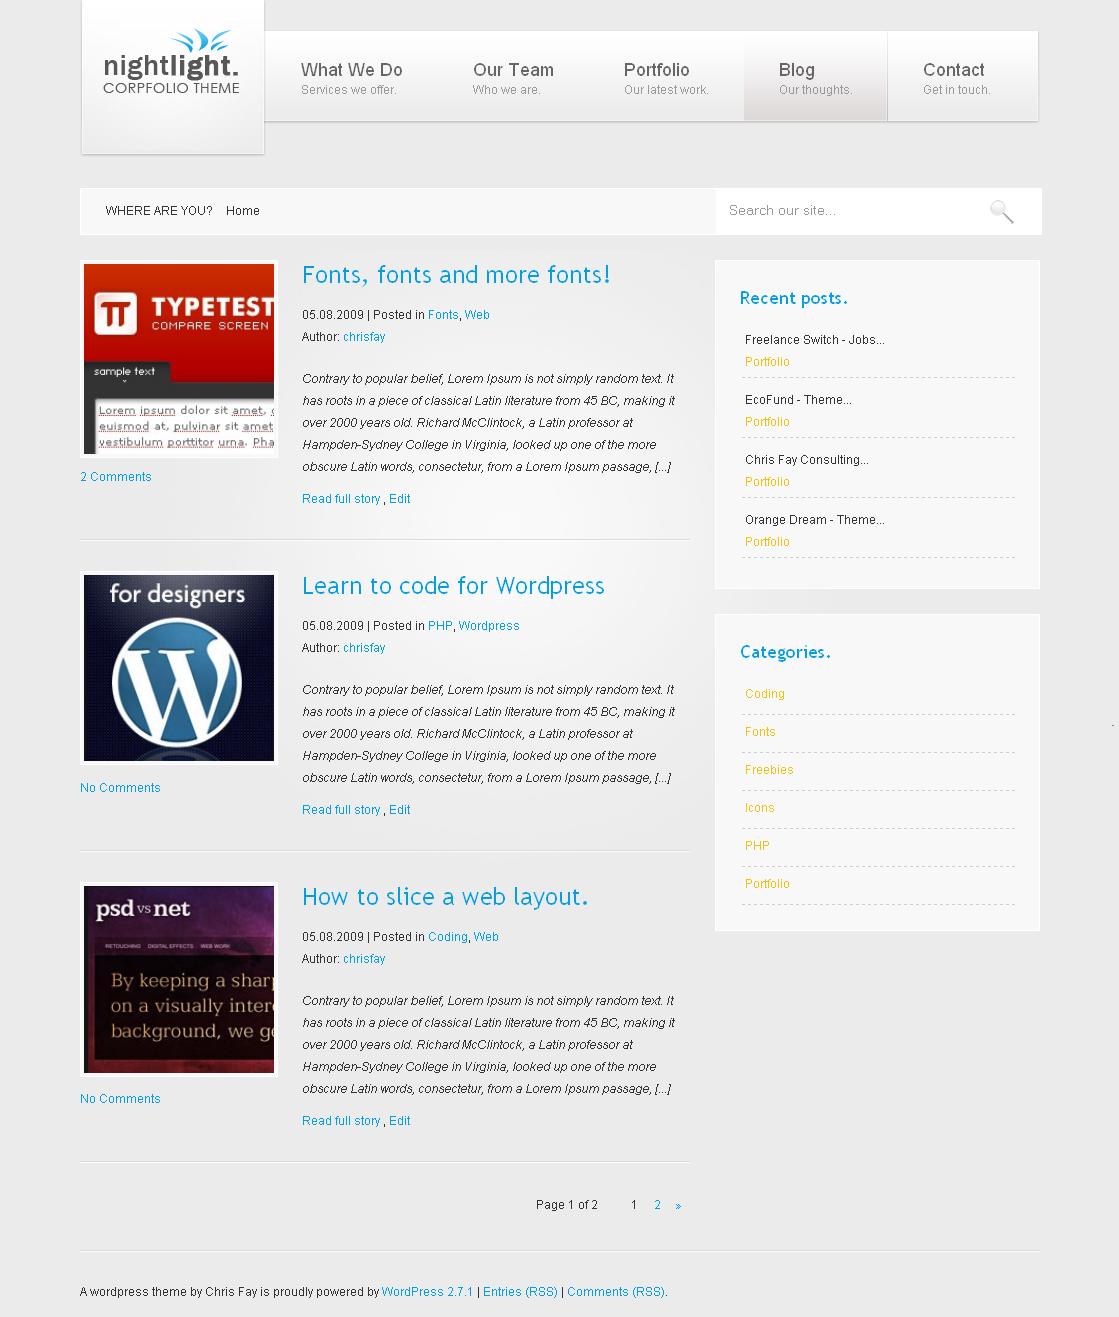 nightLight - Wordpress Theme - WhiteSilver color scheme  Styling for the WhiteSilver color scheme.